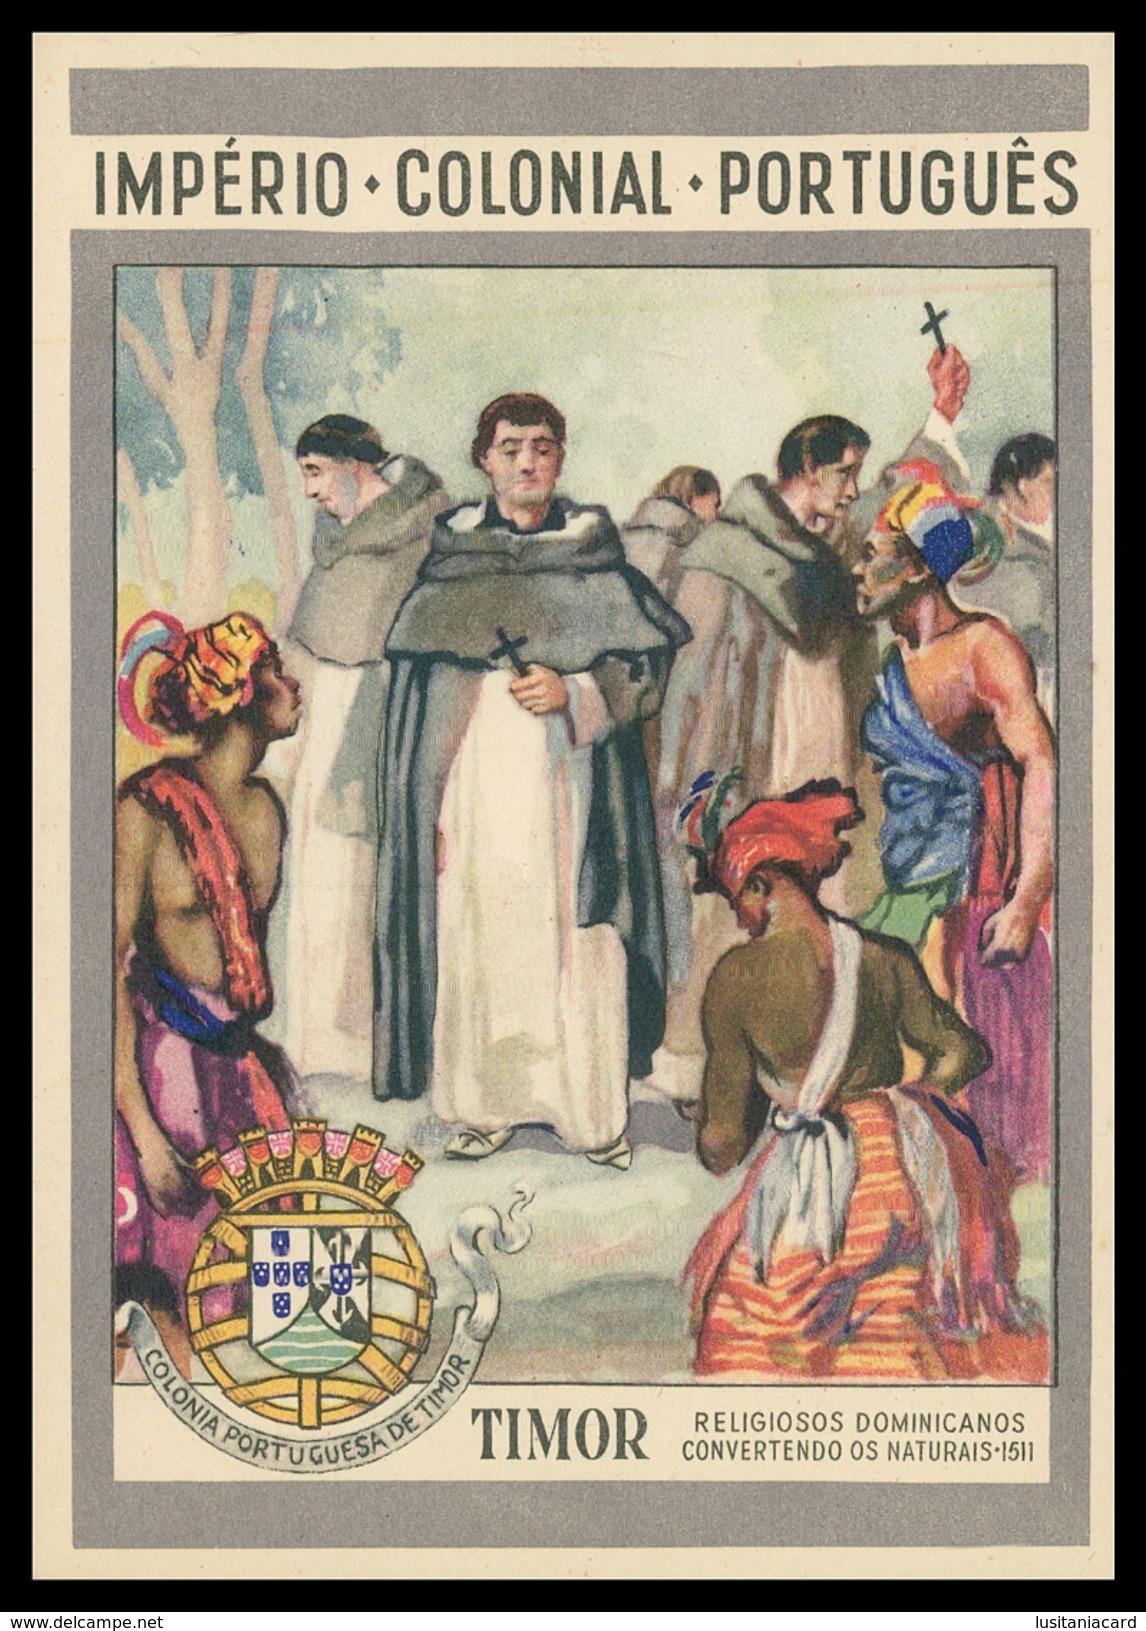 TIMOR - Religiosos Dominicanos Convertendo Os Naturais - 1511.    Carte Postale - Timor Oriental